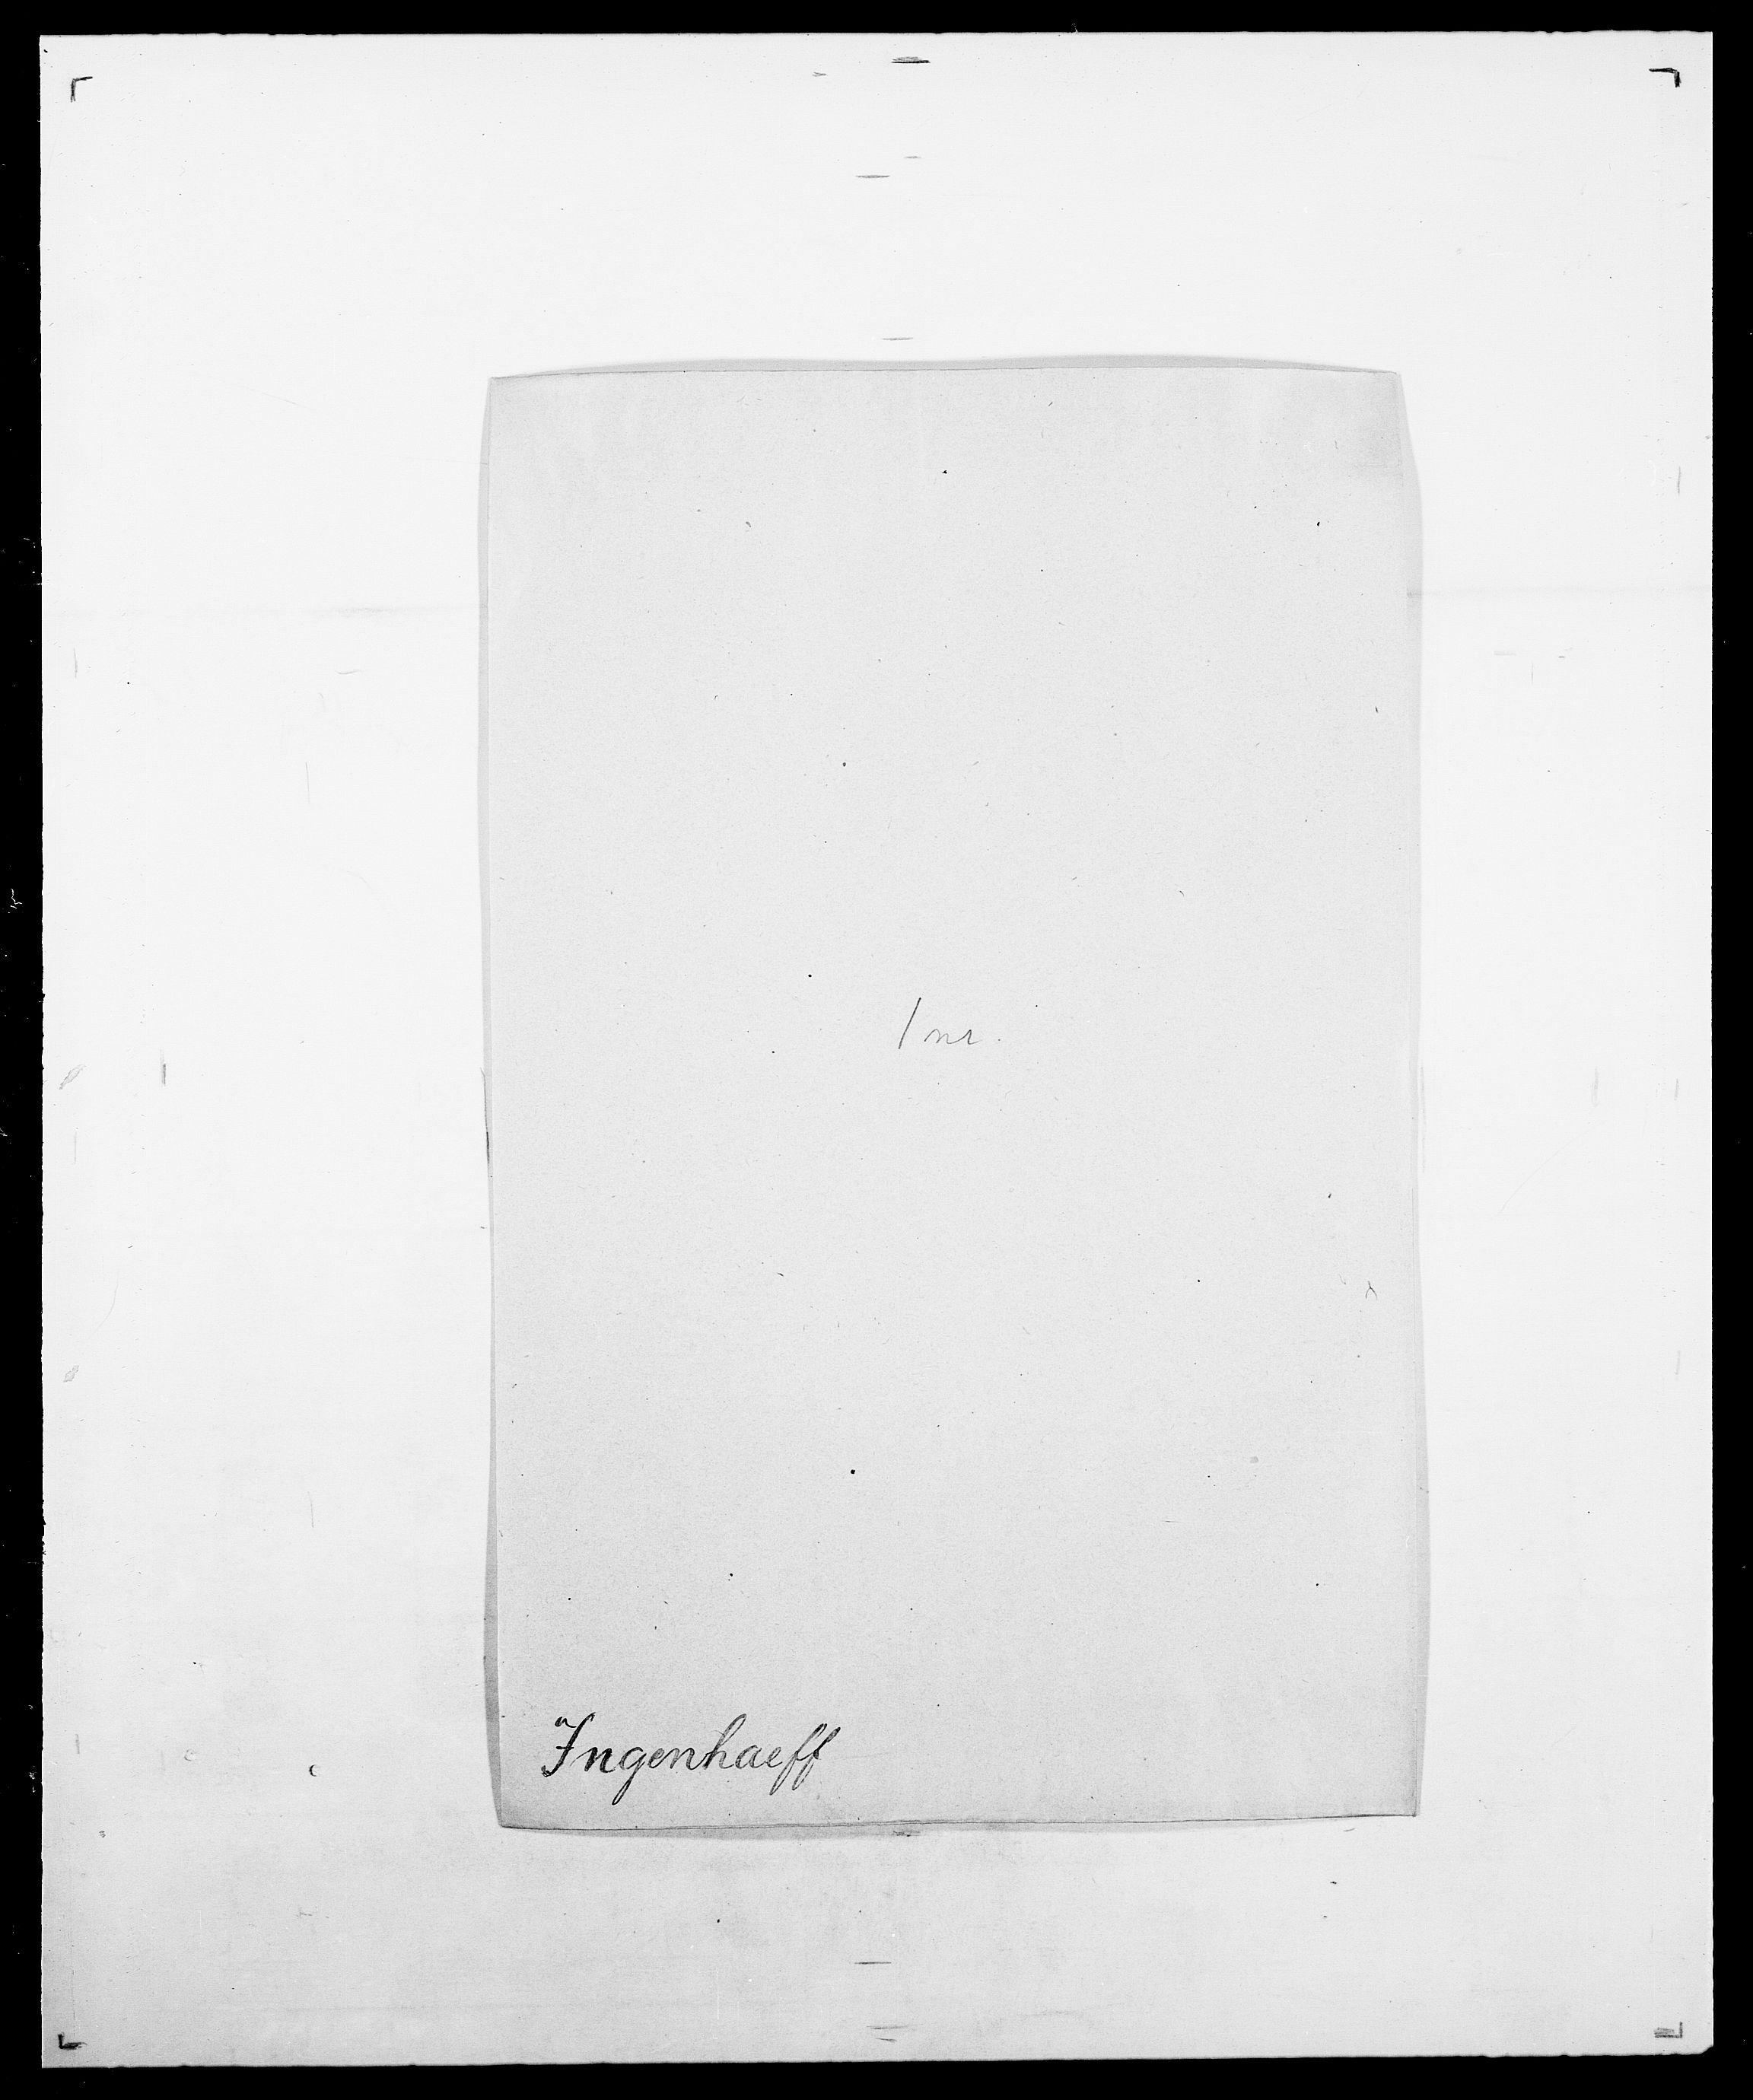 SAO, Delgobe, Charles Antoine - samling, D/Da/L0019: van der Hude - Joys, s. 784